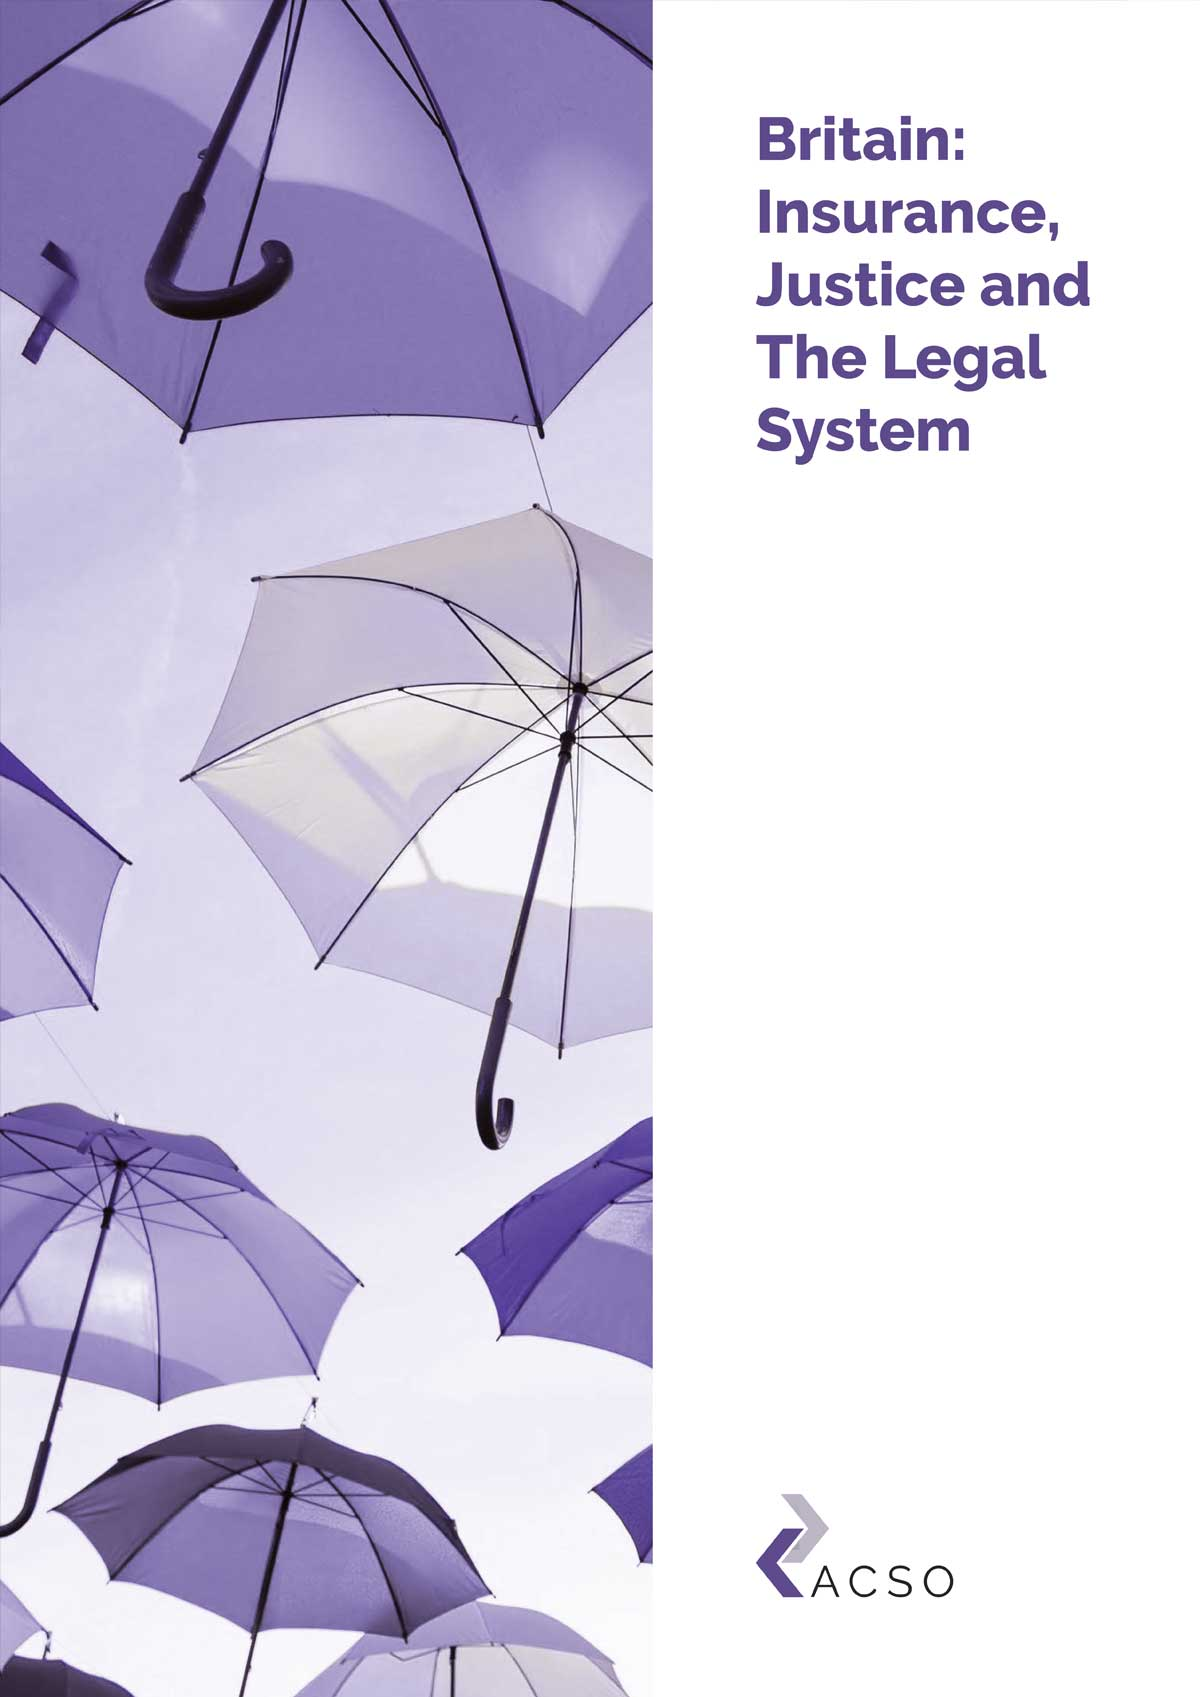 WHITE PAPER: BRITAIN'S CIVIL JUSTICE SERVICE IN DECLINE